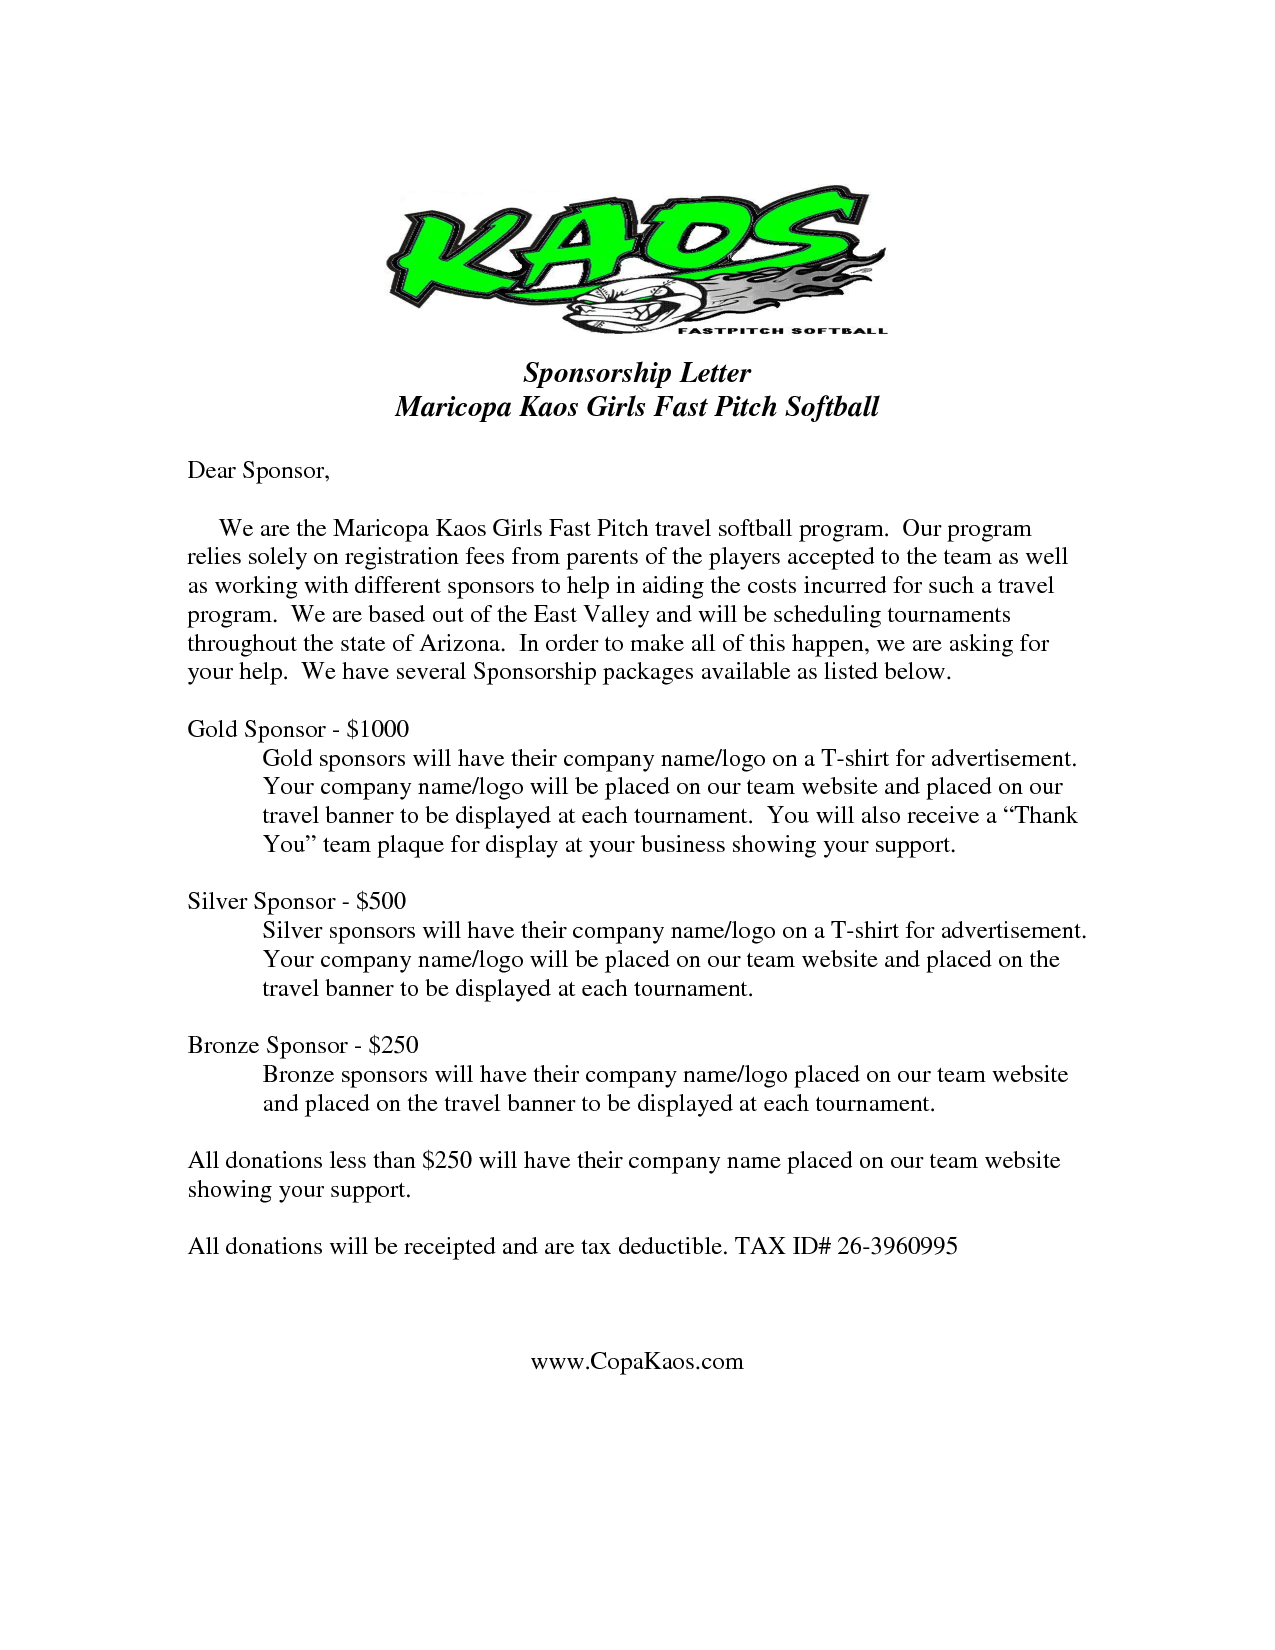 School Donation Request Letter Template - Image Result for Sample Sponsor Request Letter Donation